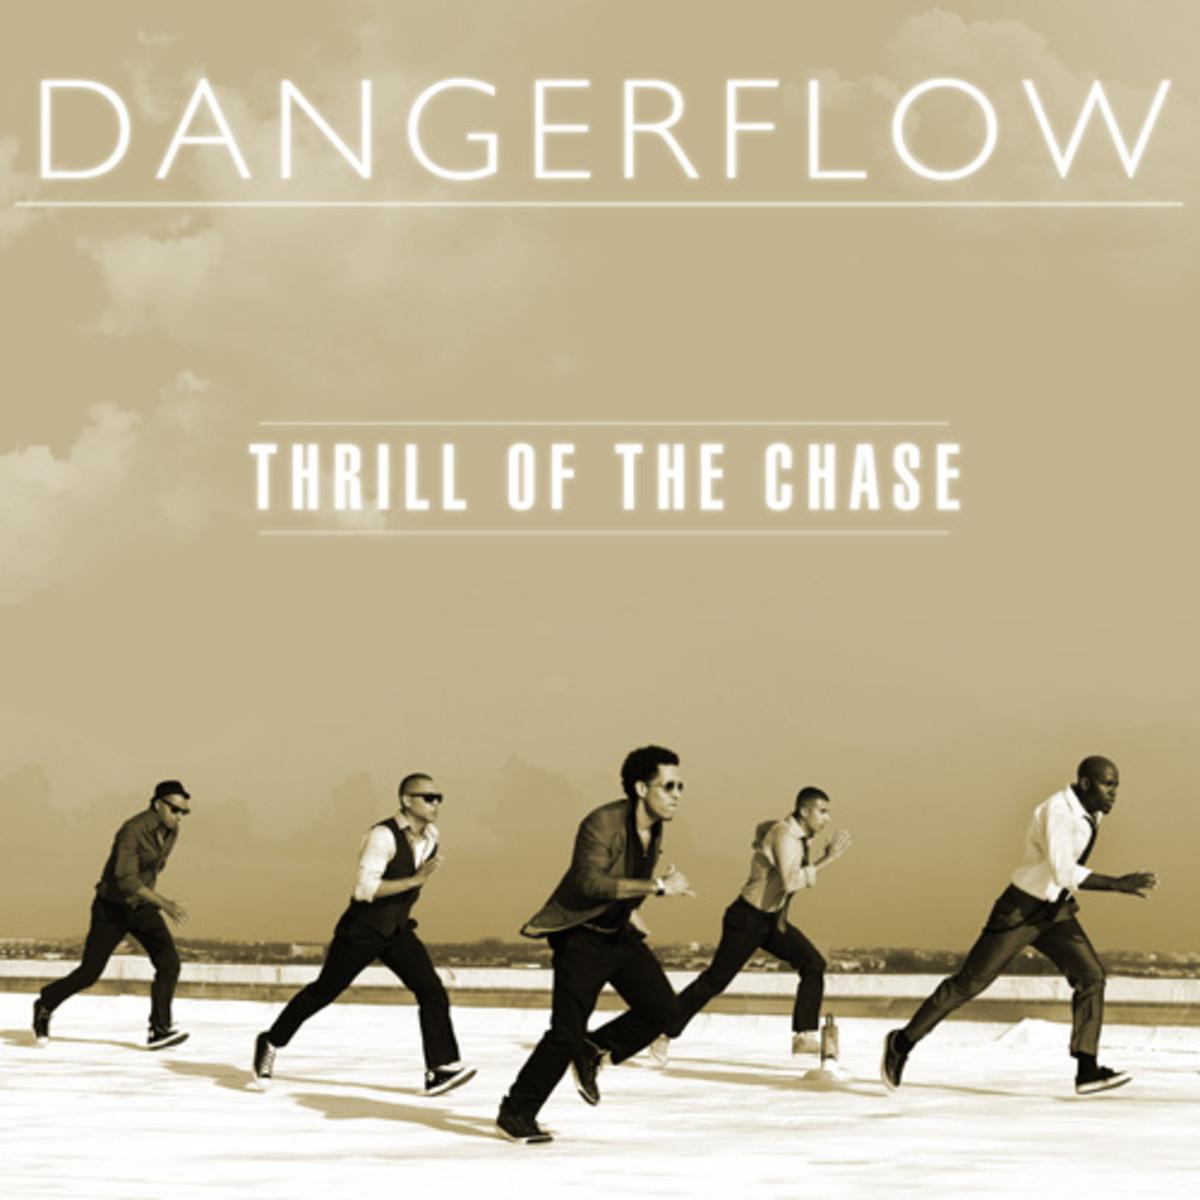 dangerflow-thrillofthechase.jpg